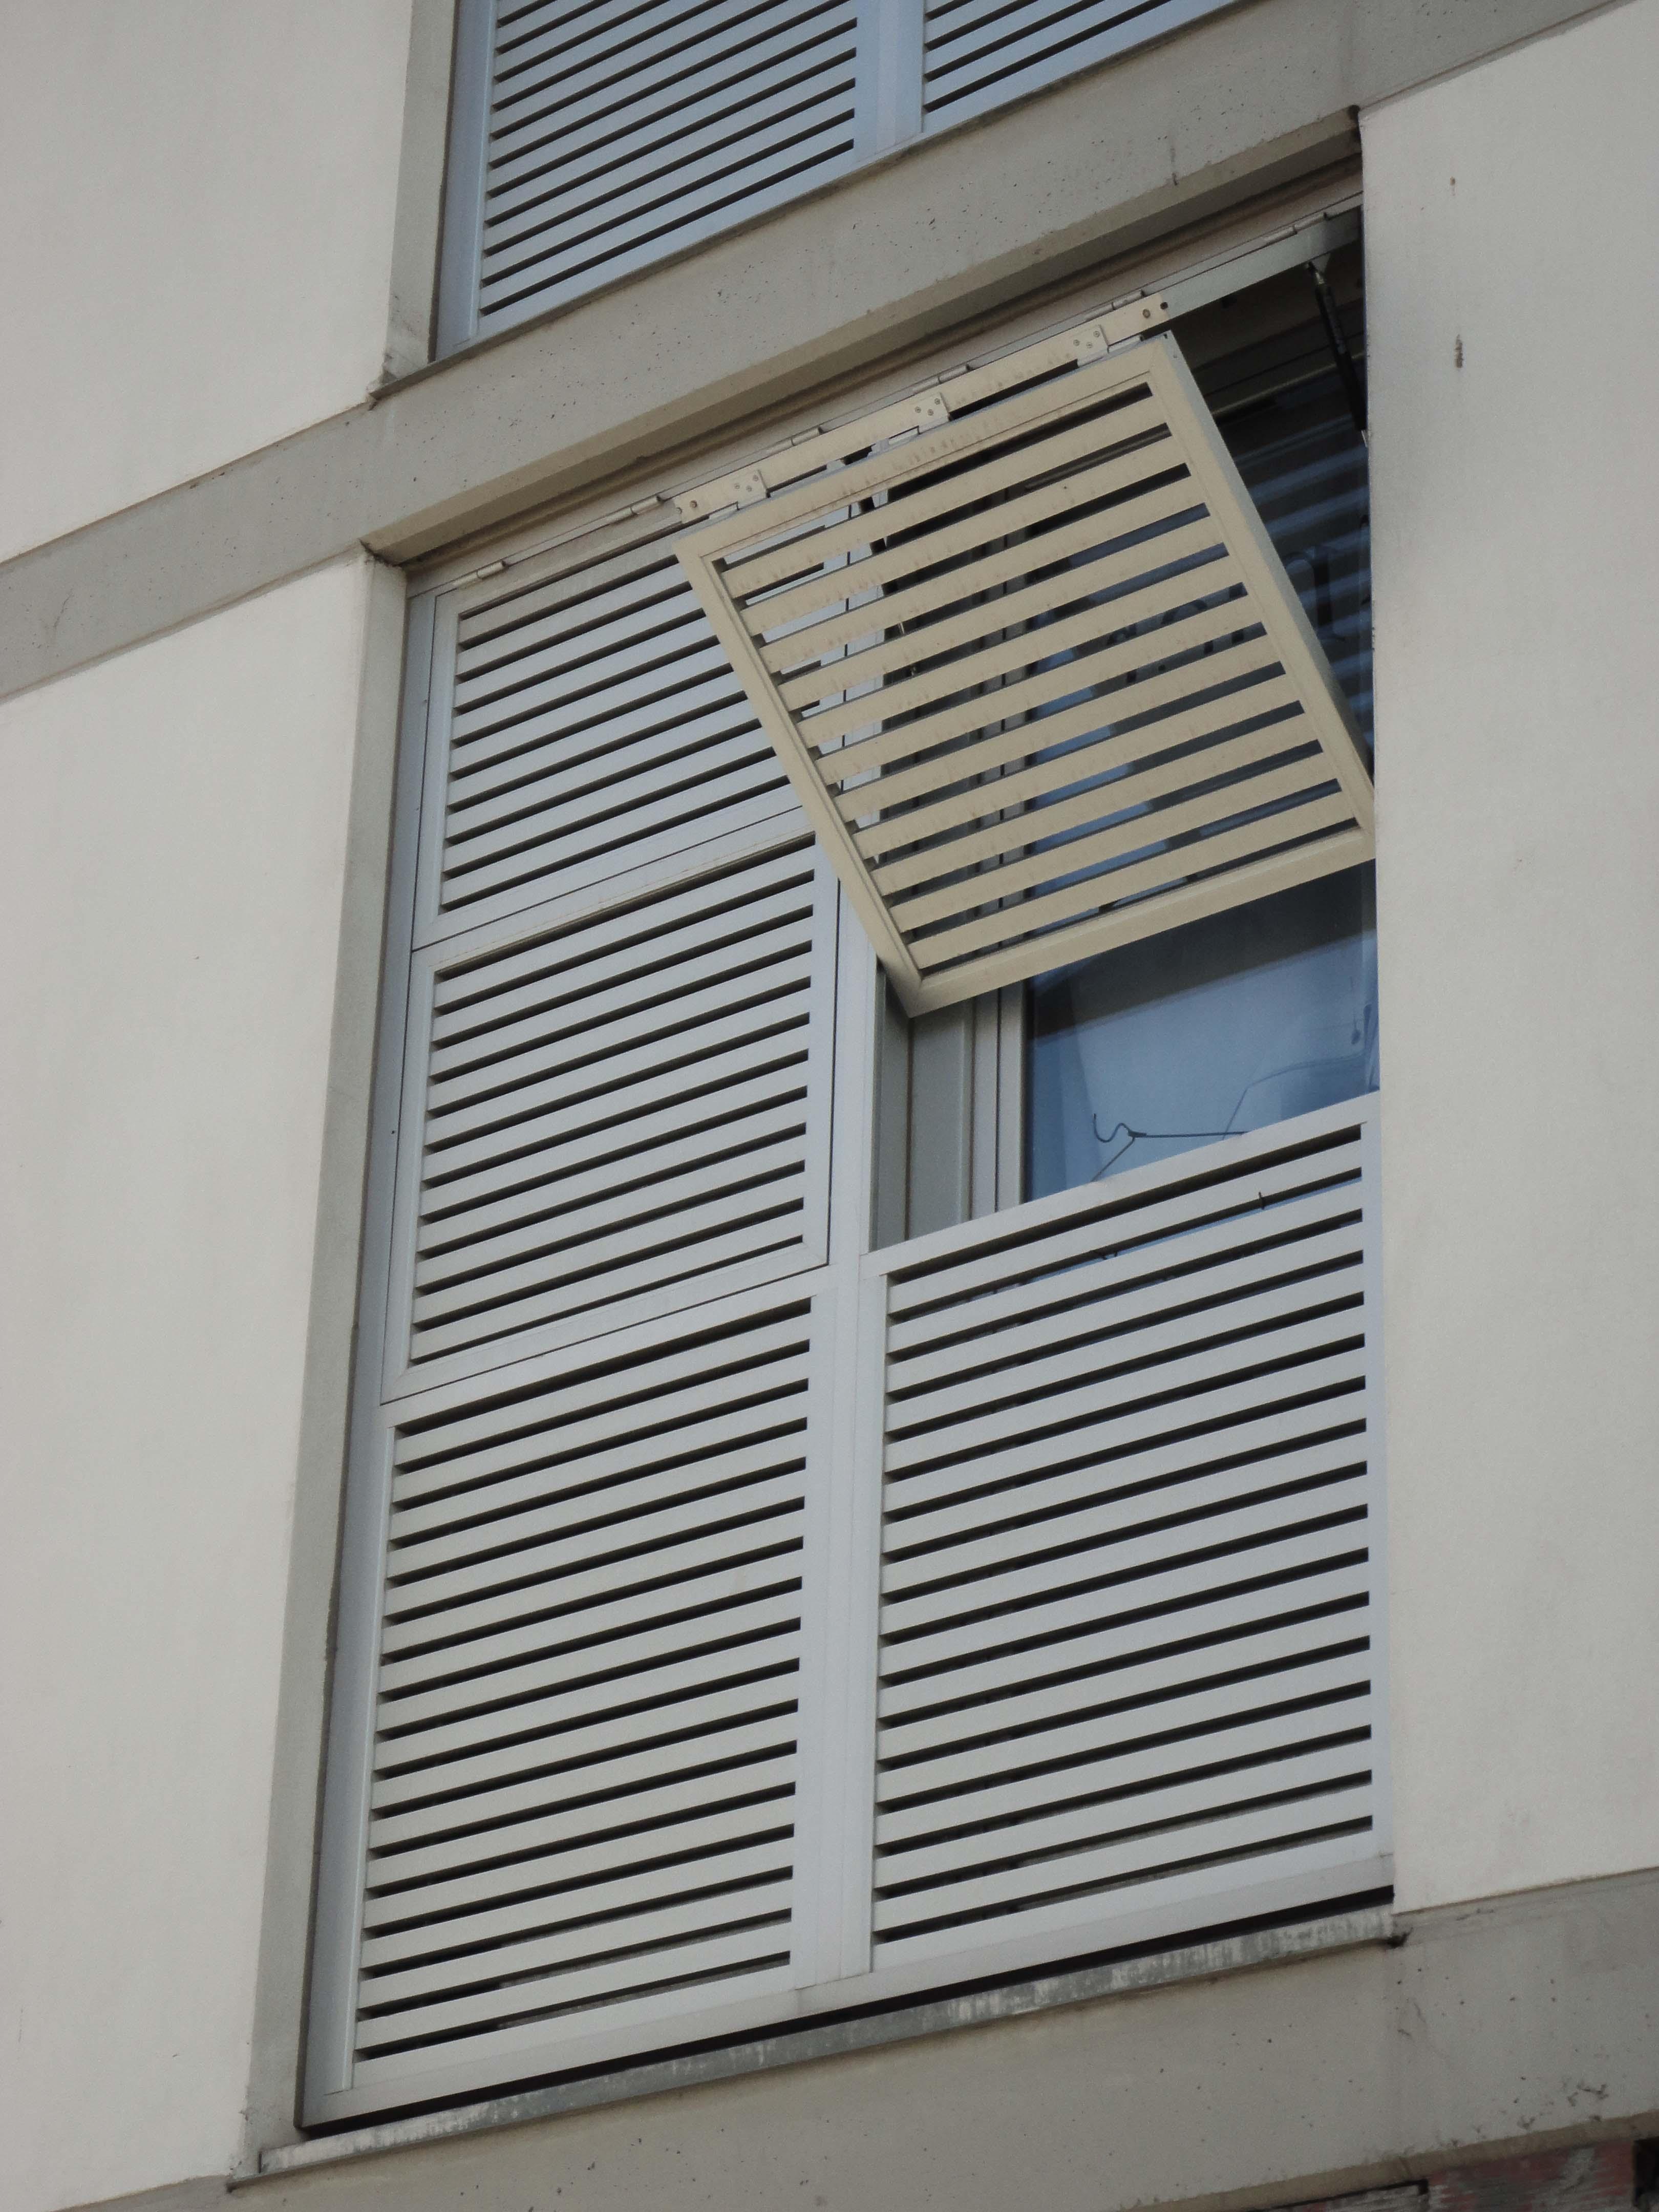 Vertical Folding Sliding Louvered Shutters In 22 260